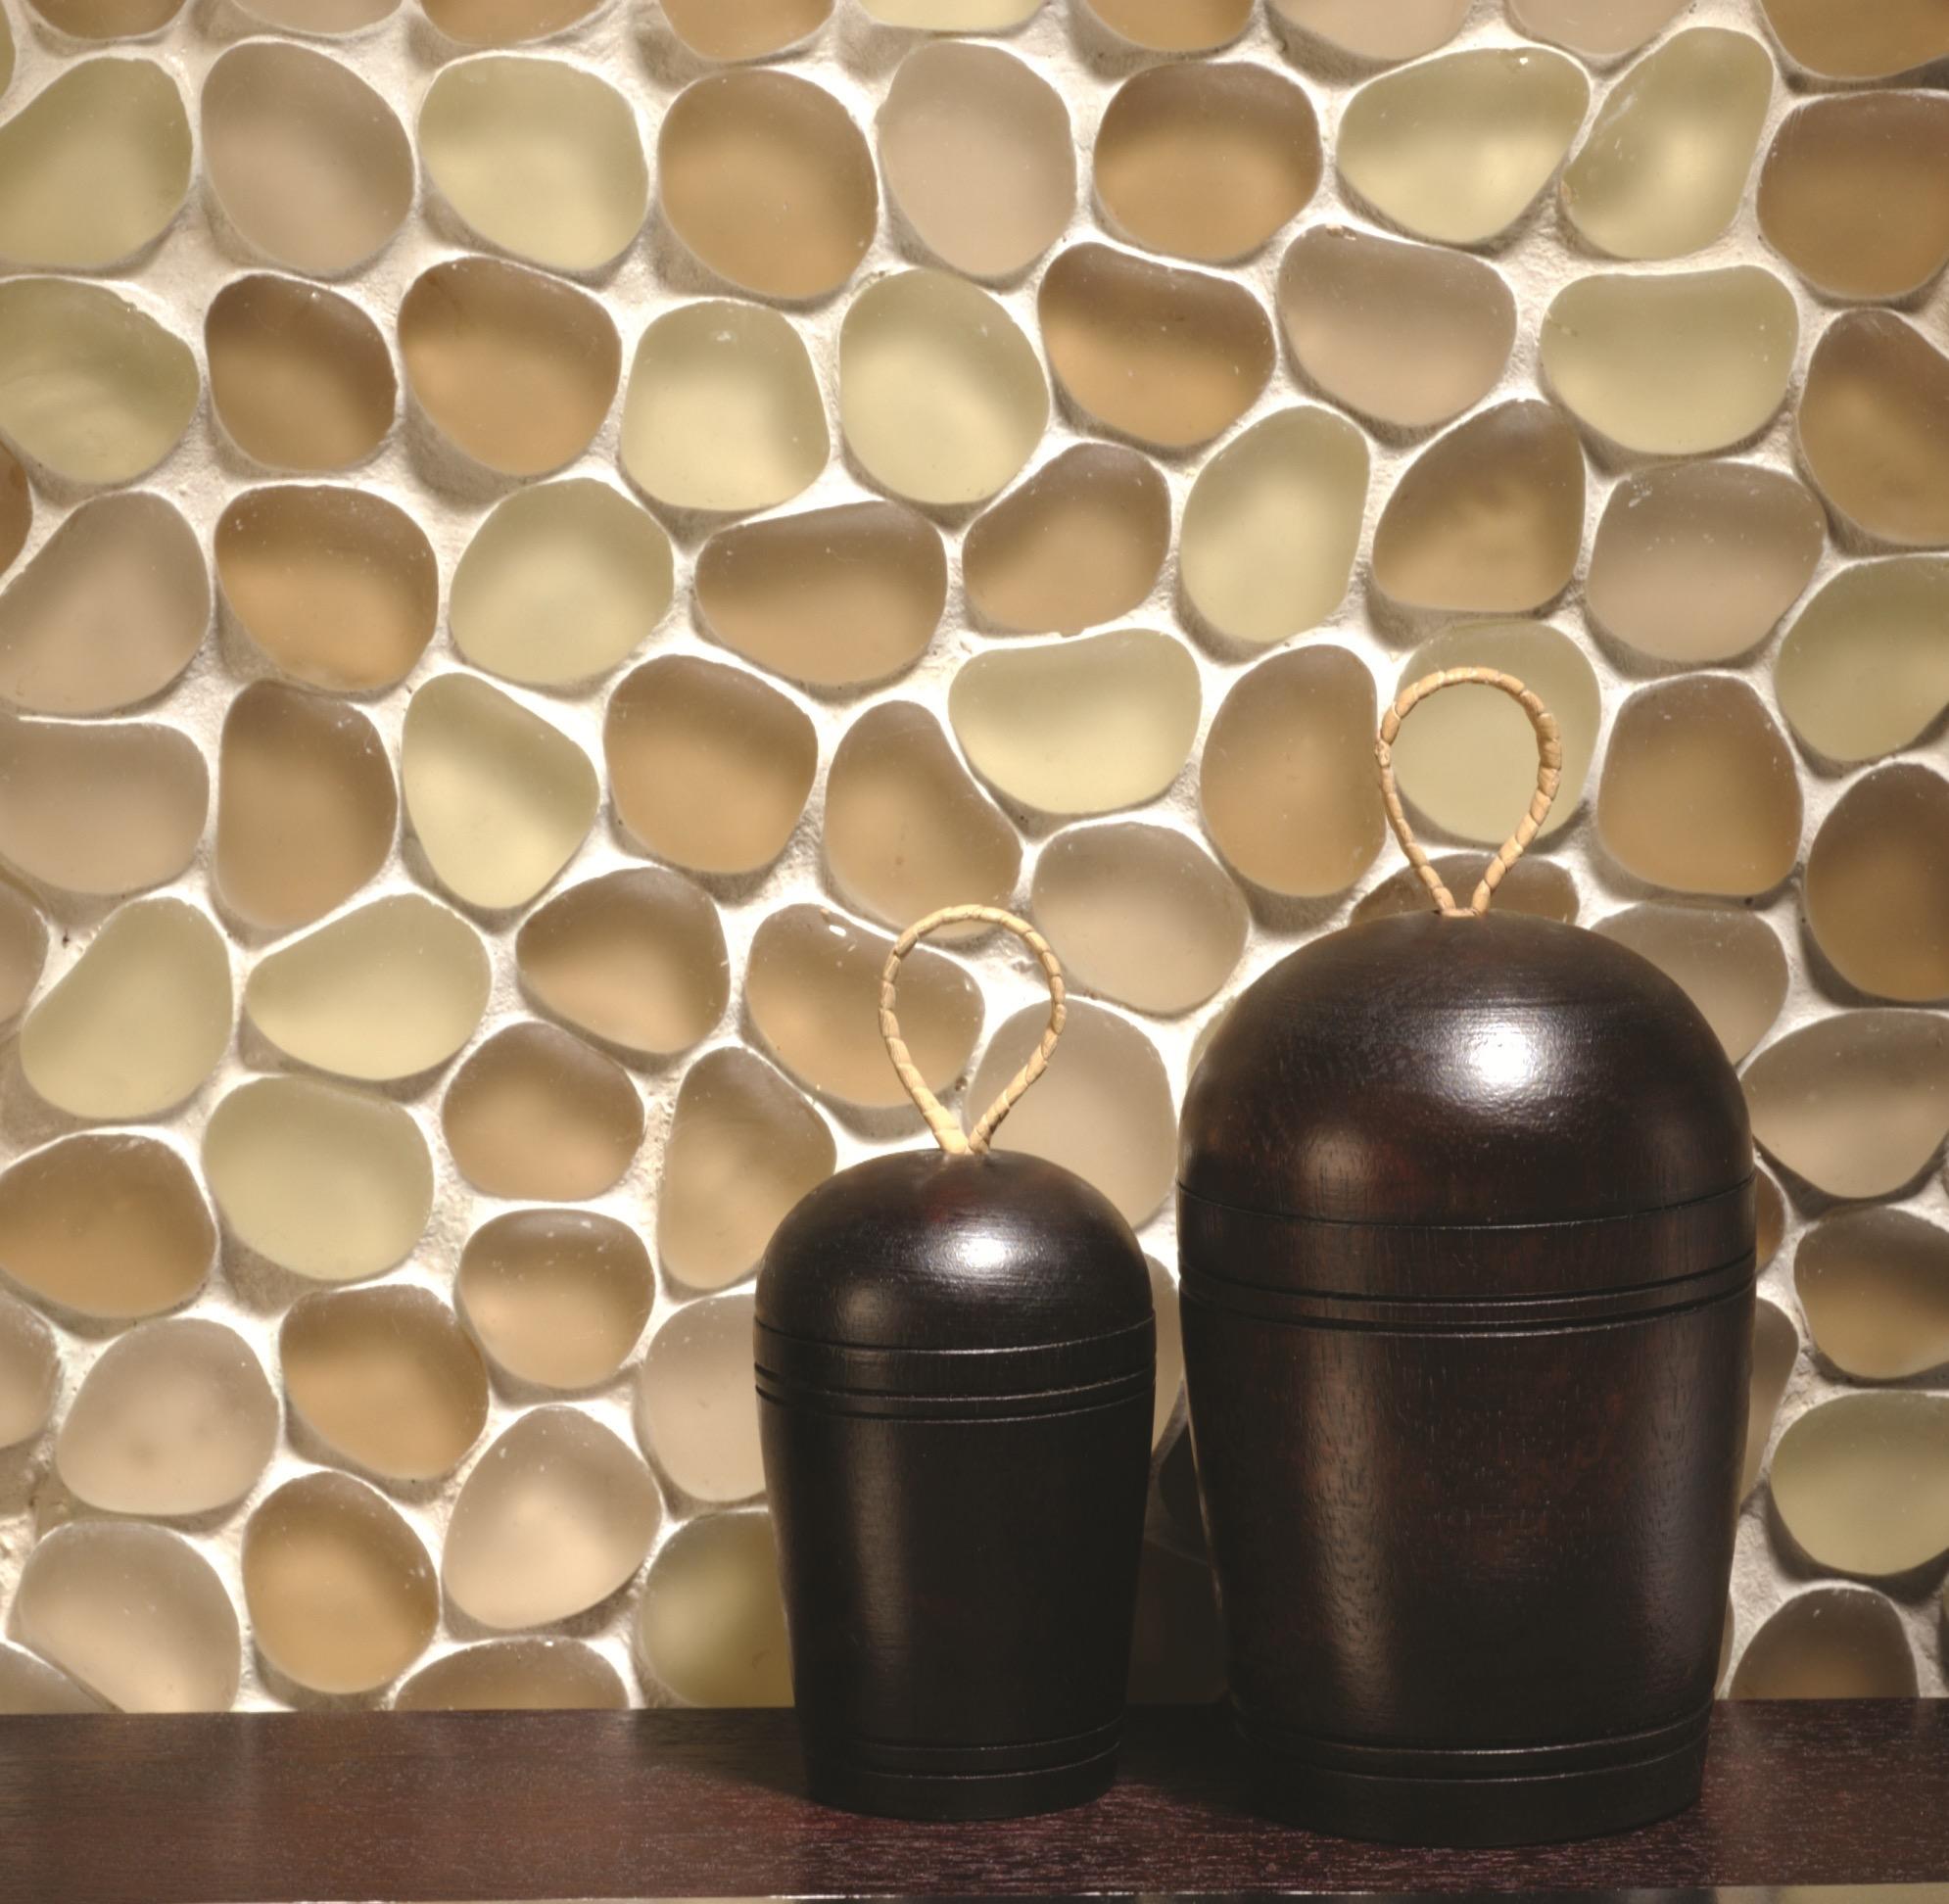 Original Style_Mosaics_Sumatra frosted glass pebbles.jpg